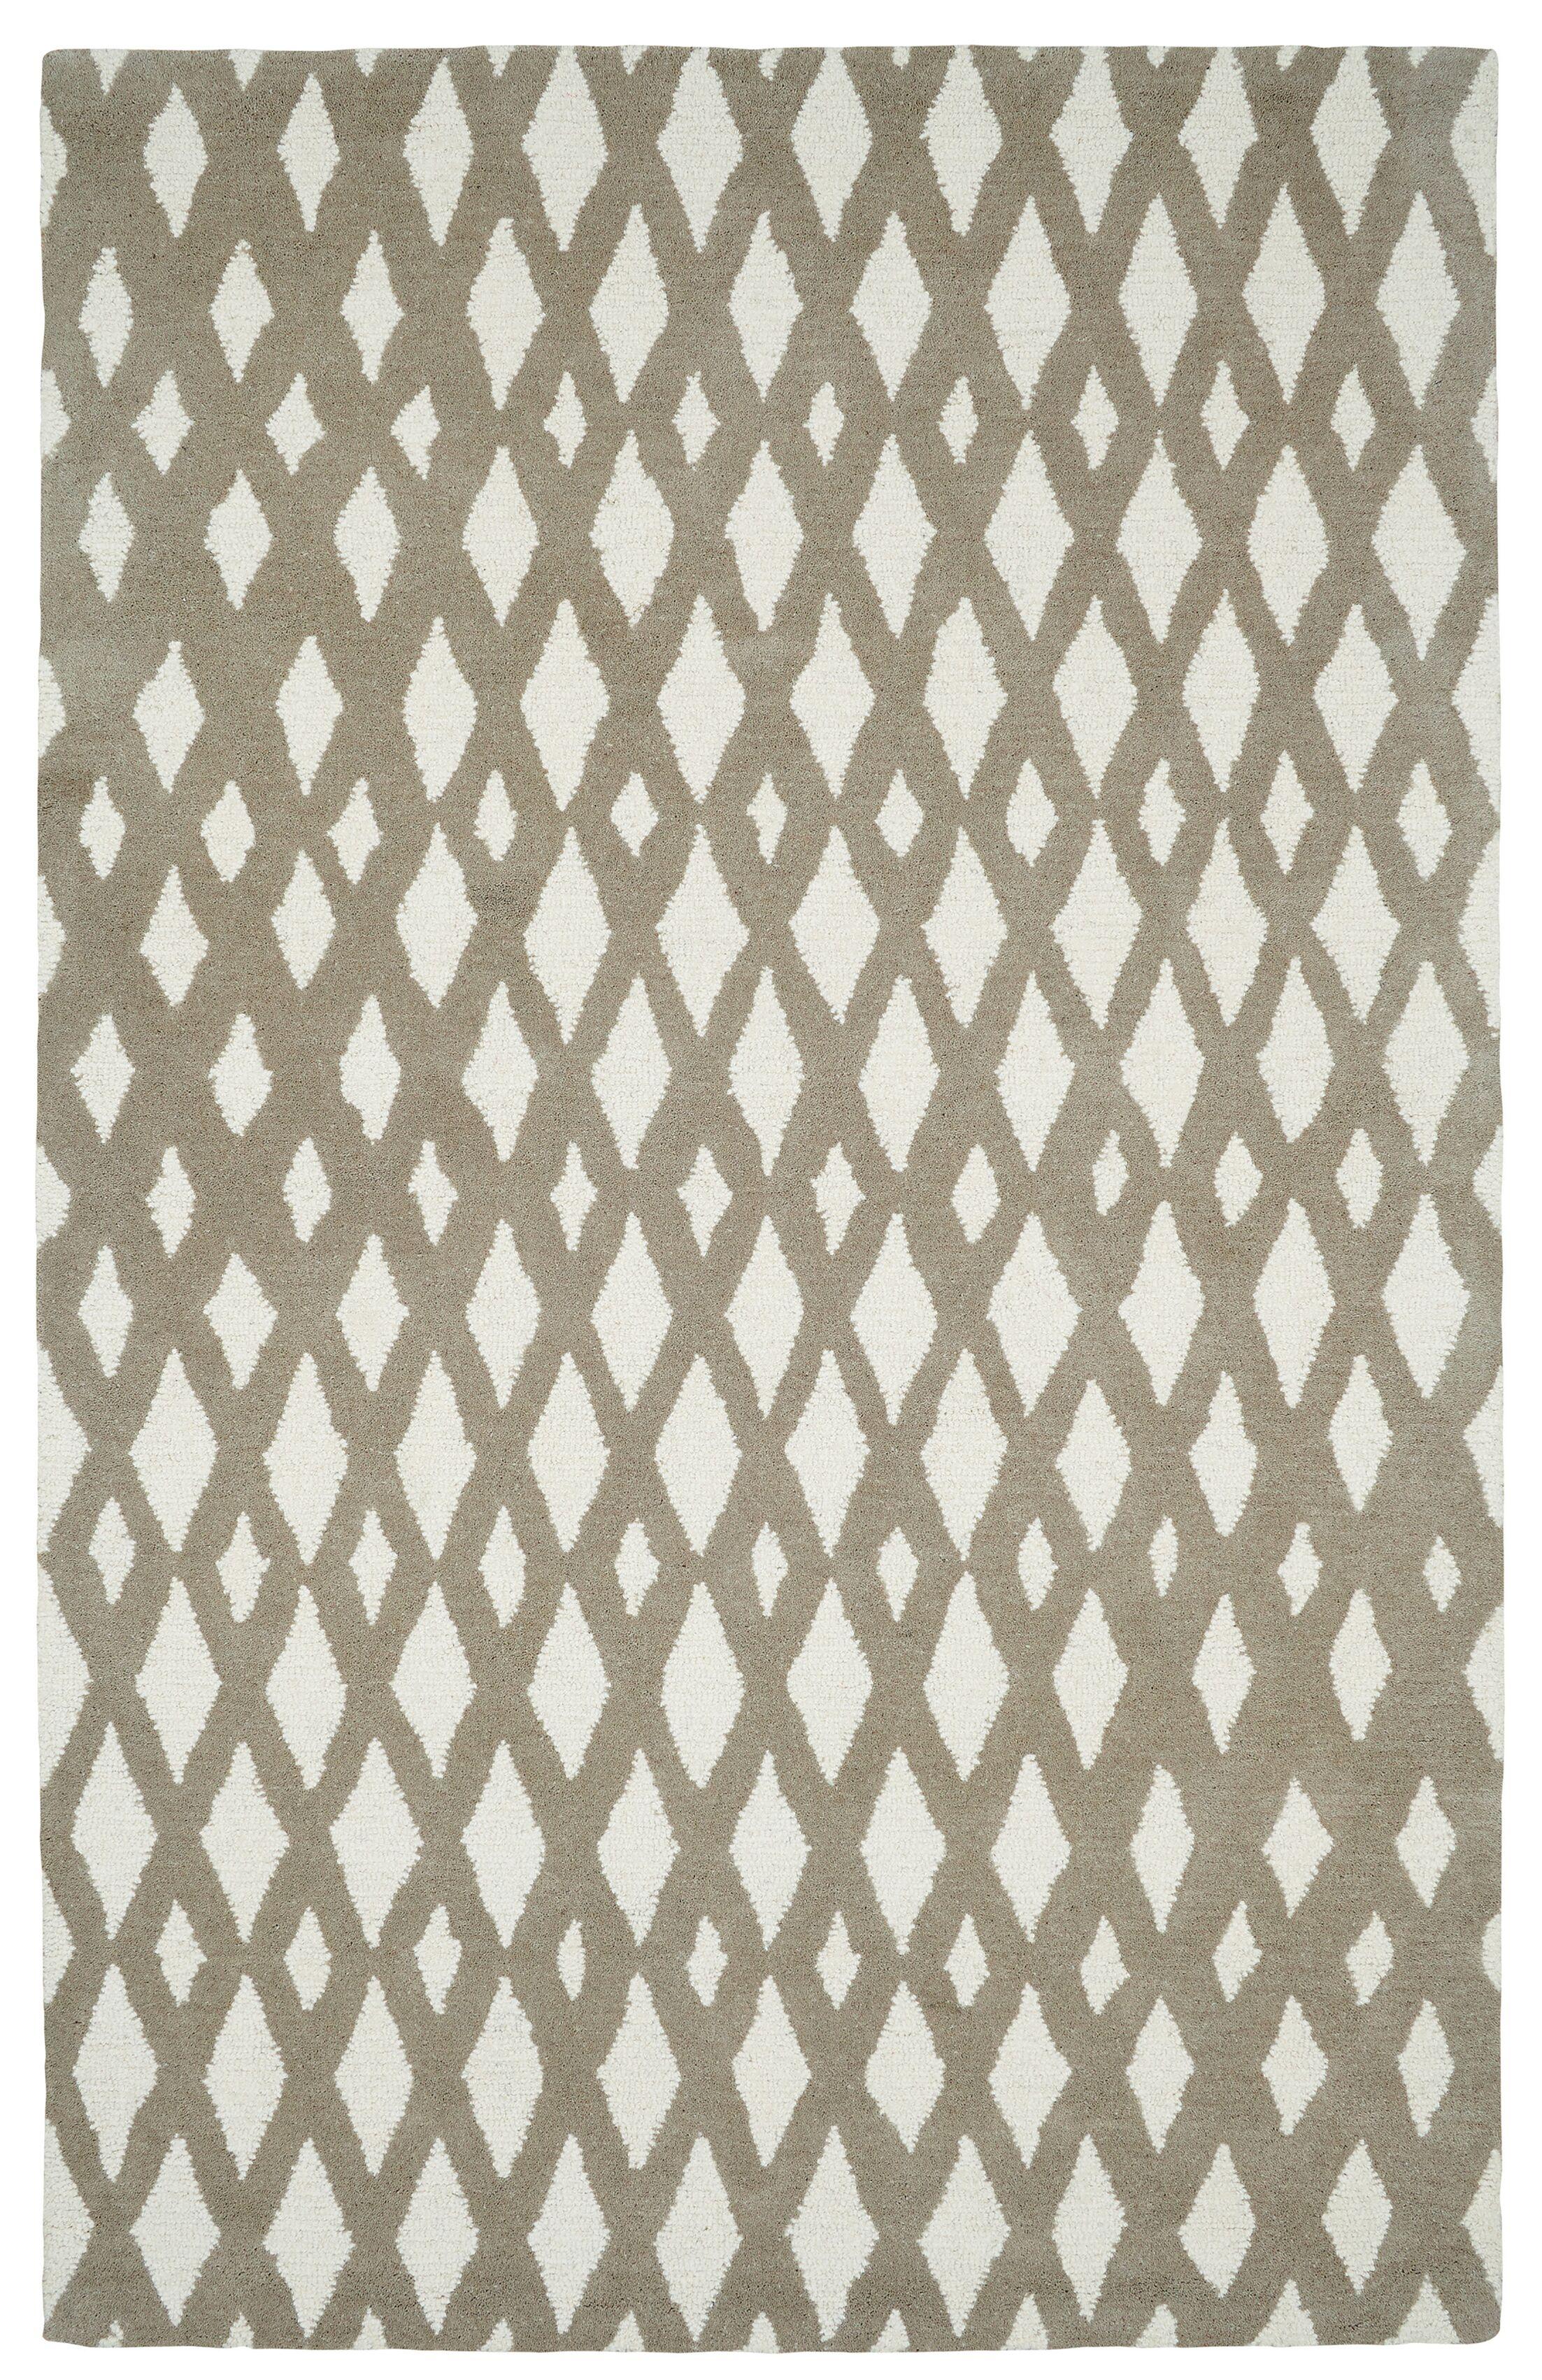 Rentz Beige/Ivory Geometric Area Rug Rug Size: Rectangle 9'6